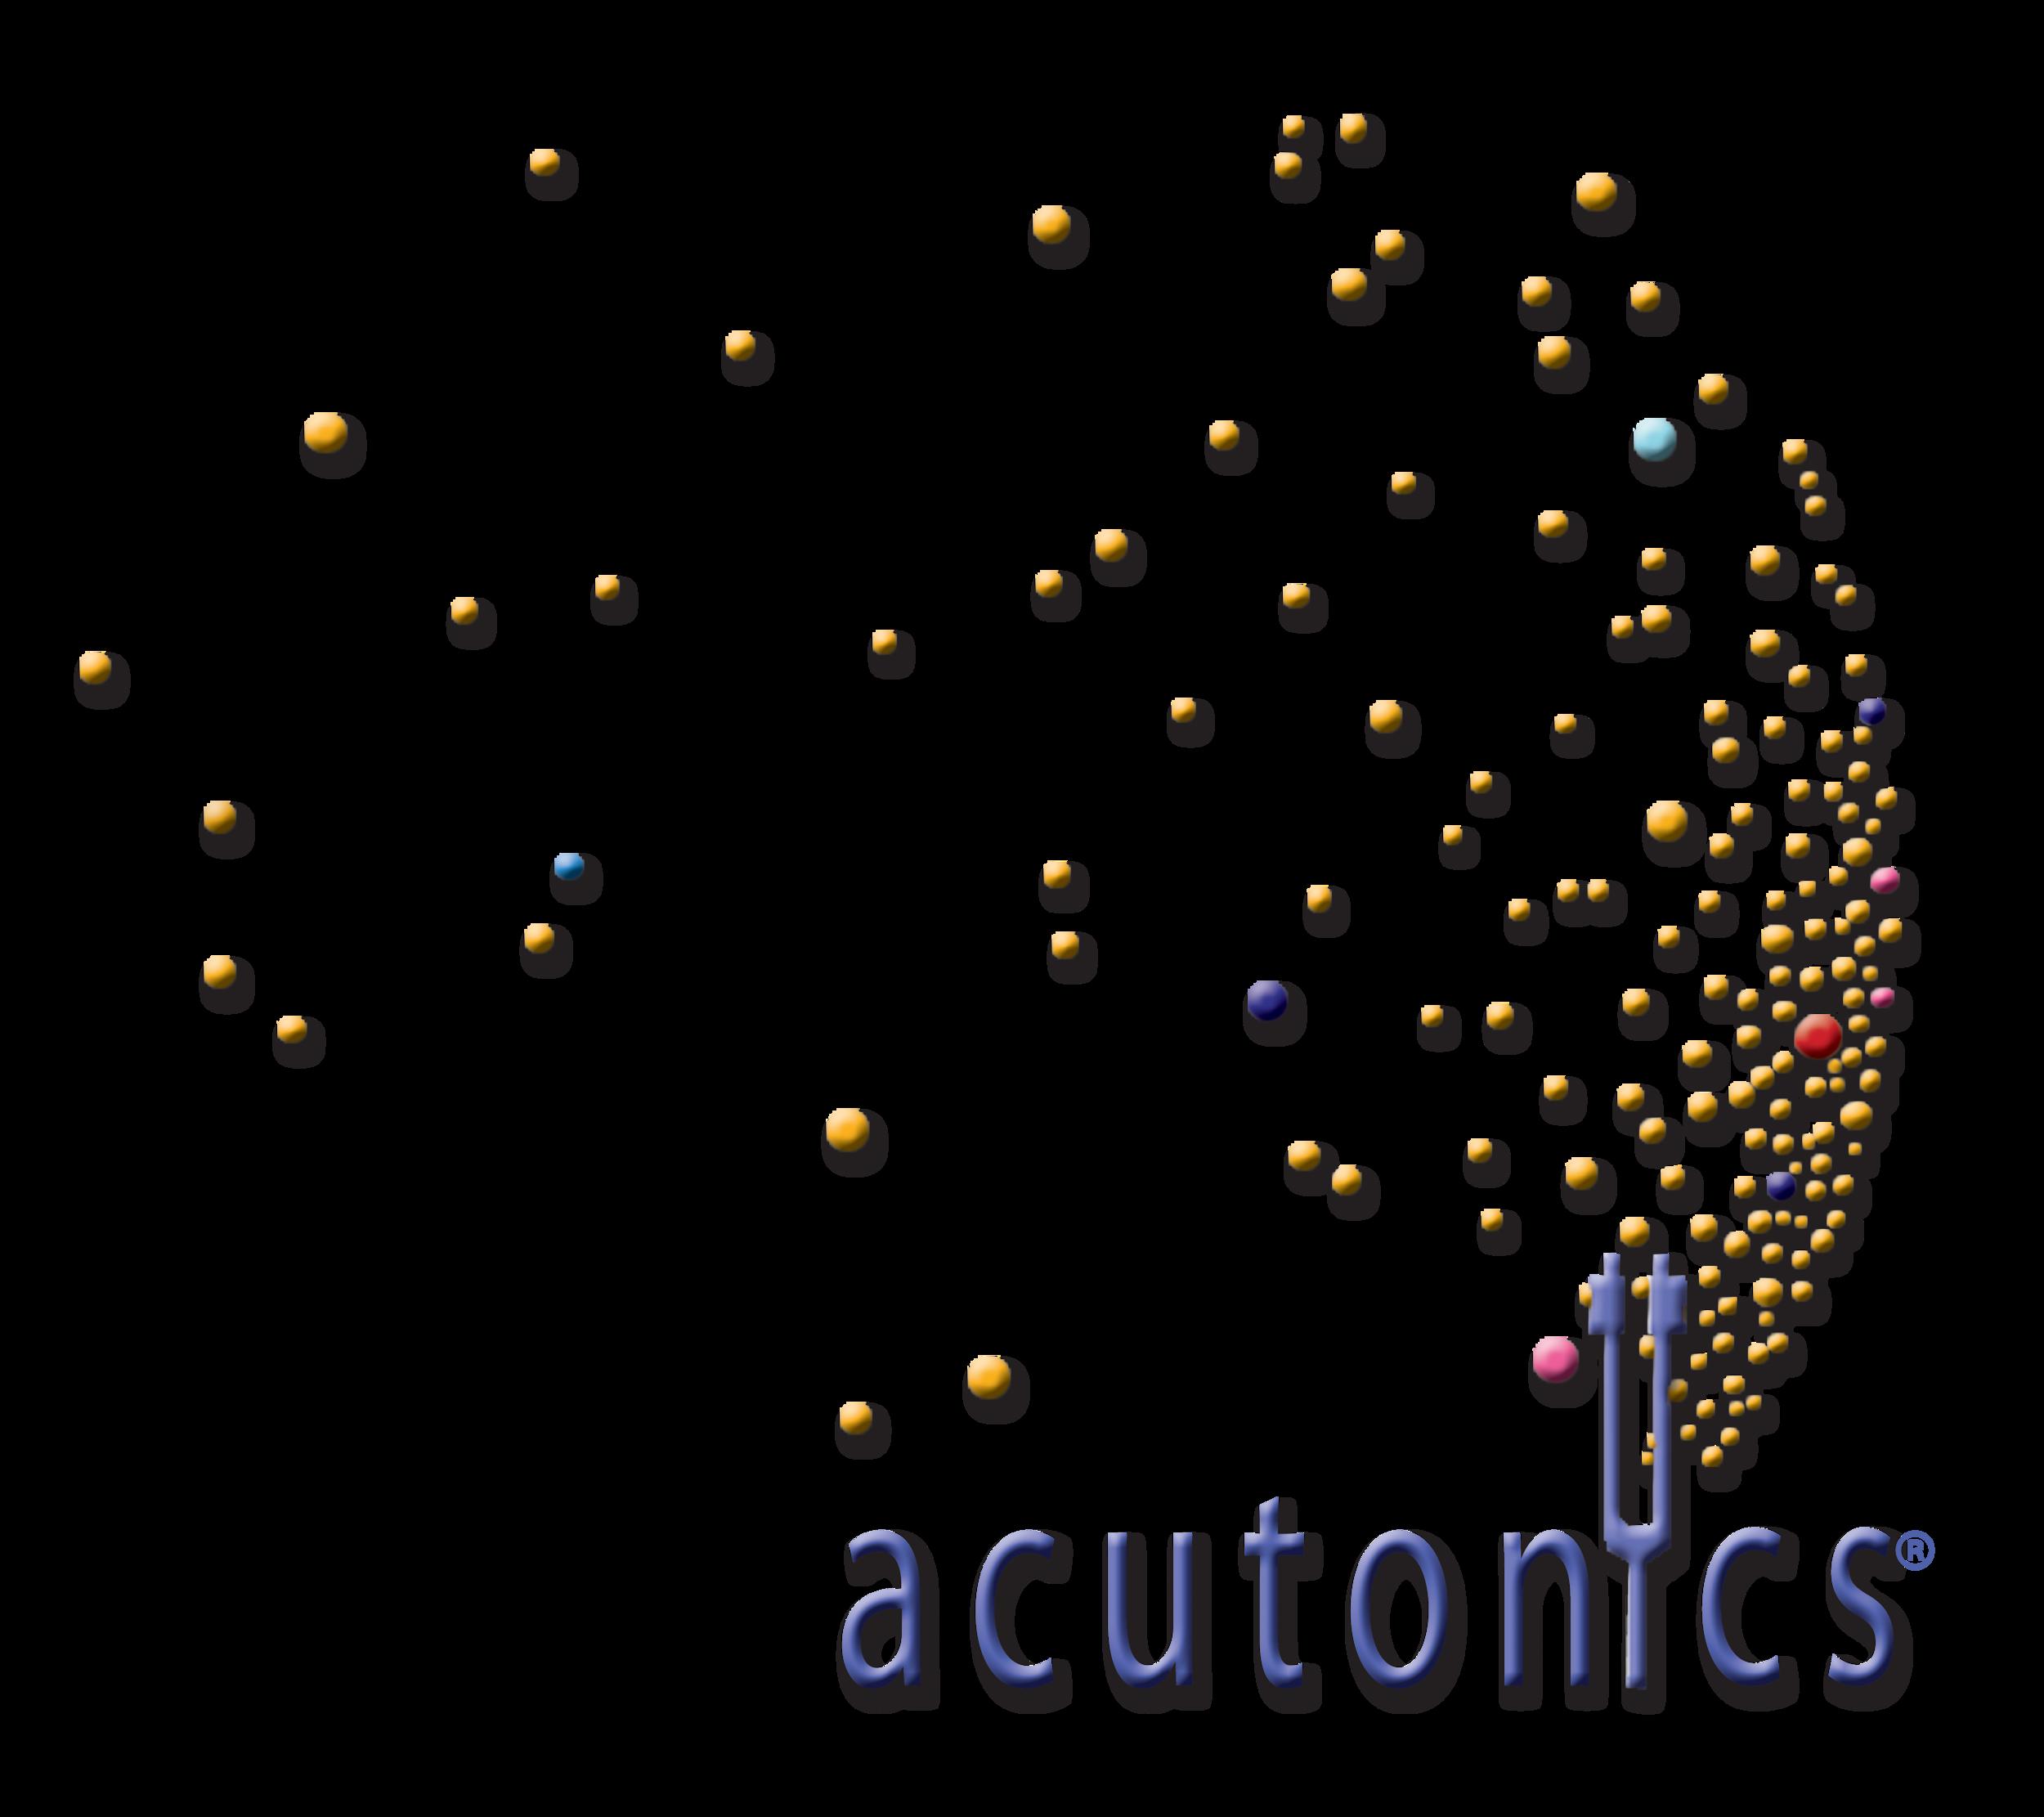 Acutonics_Transparent copy.png